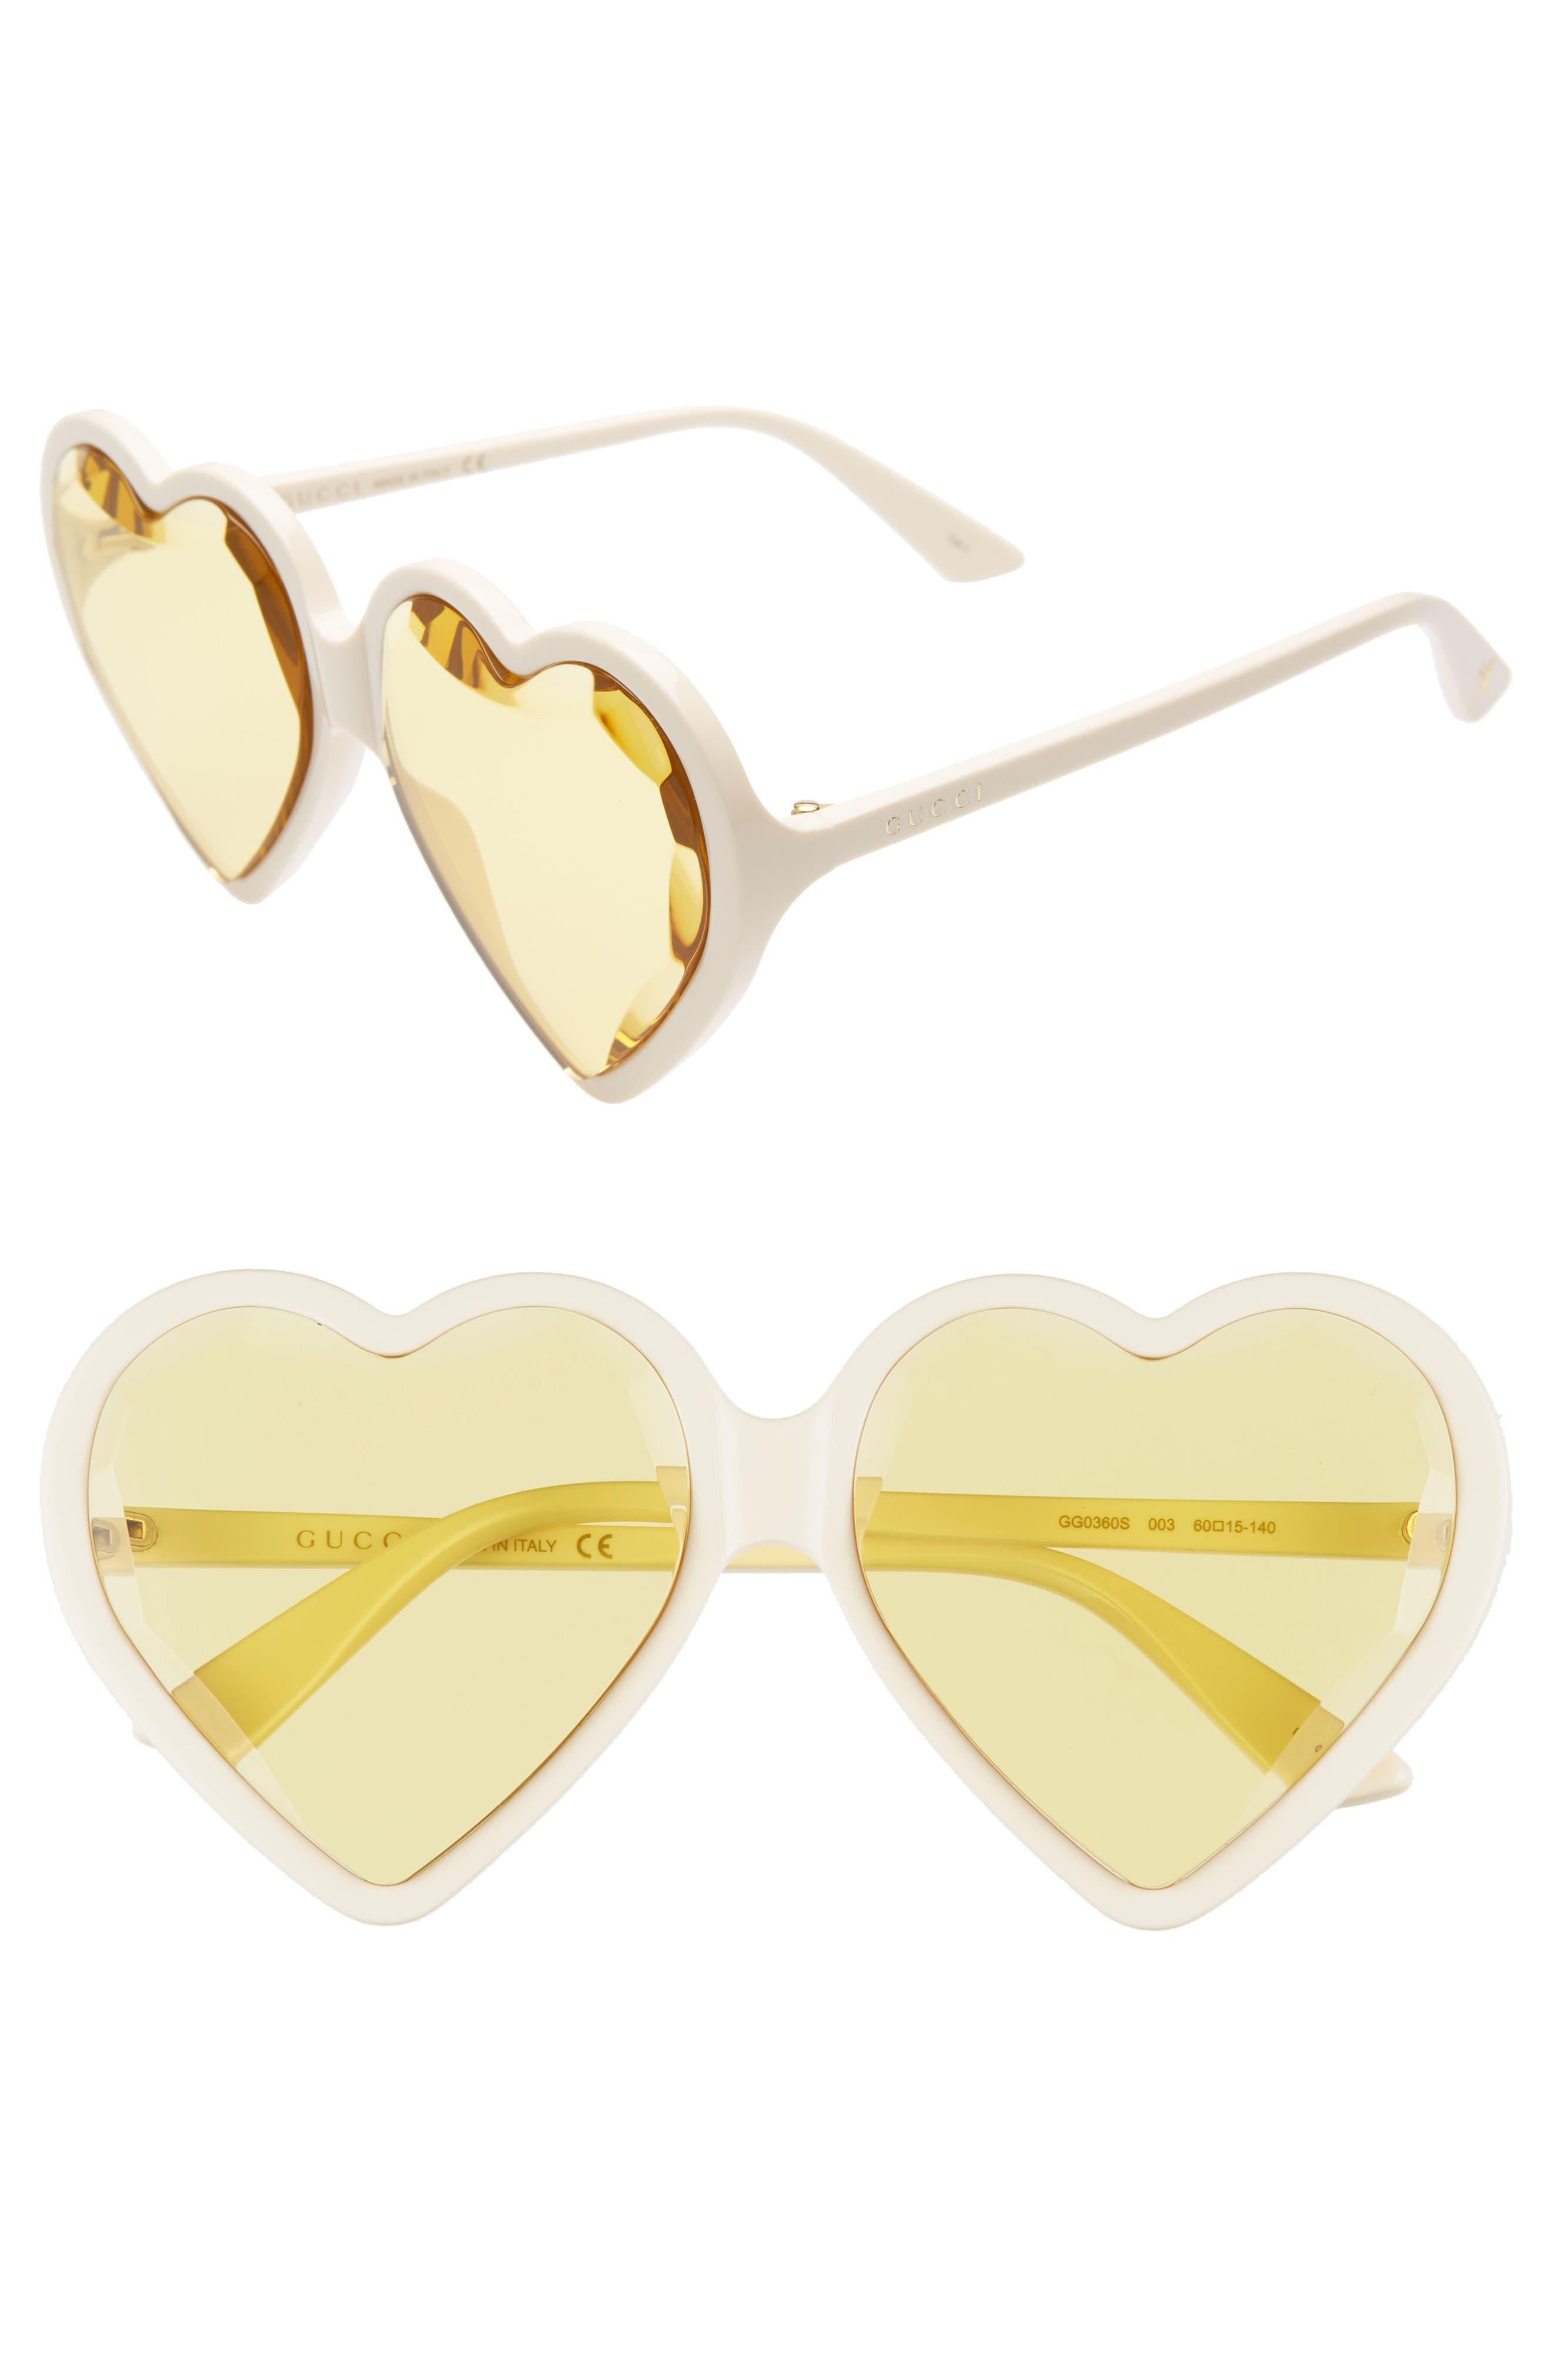 GUCCI,                             60mm Heart Sunglasses,                             Main thumbnail 1, color,                             IVORY/ YELLOW